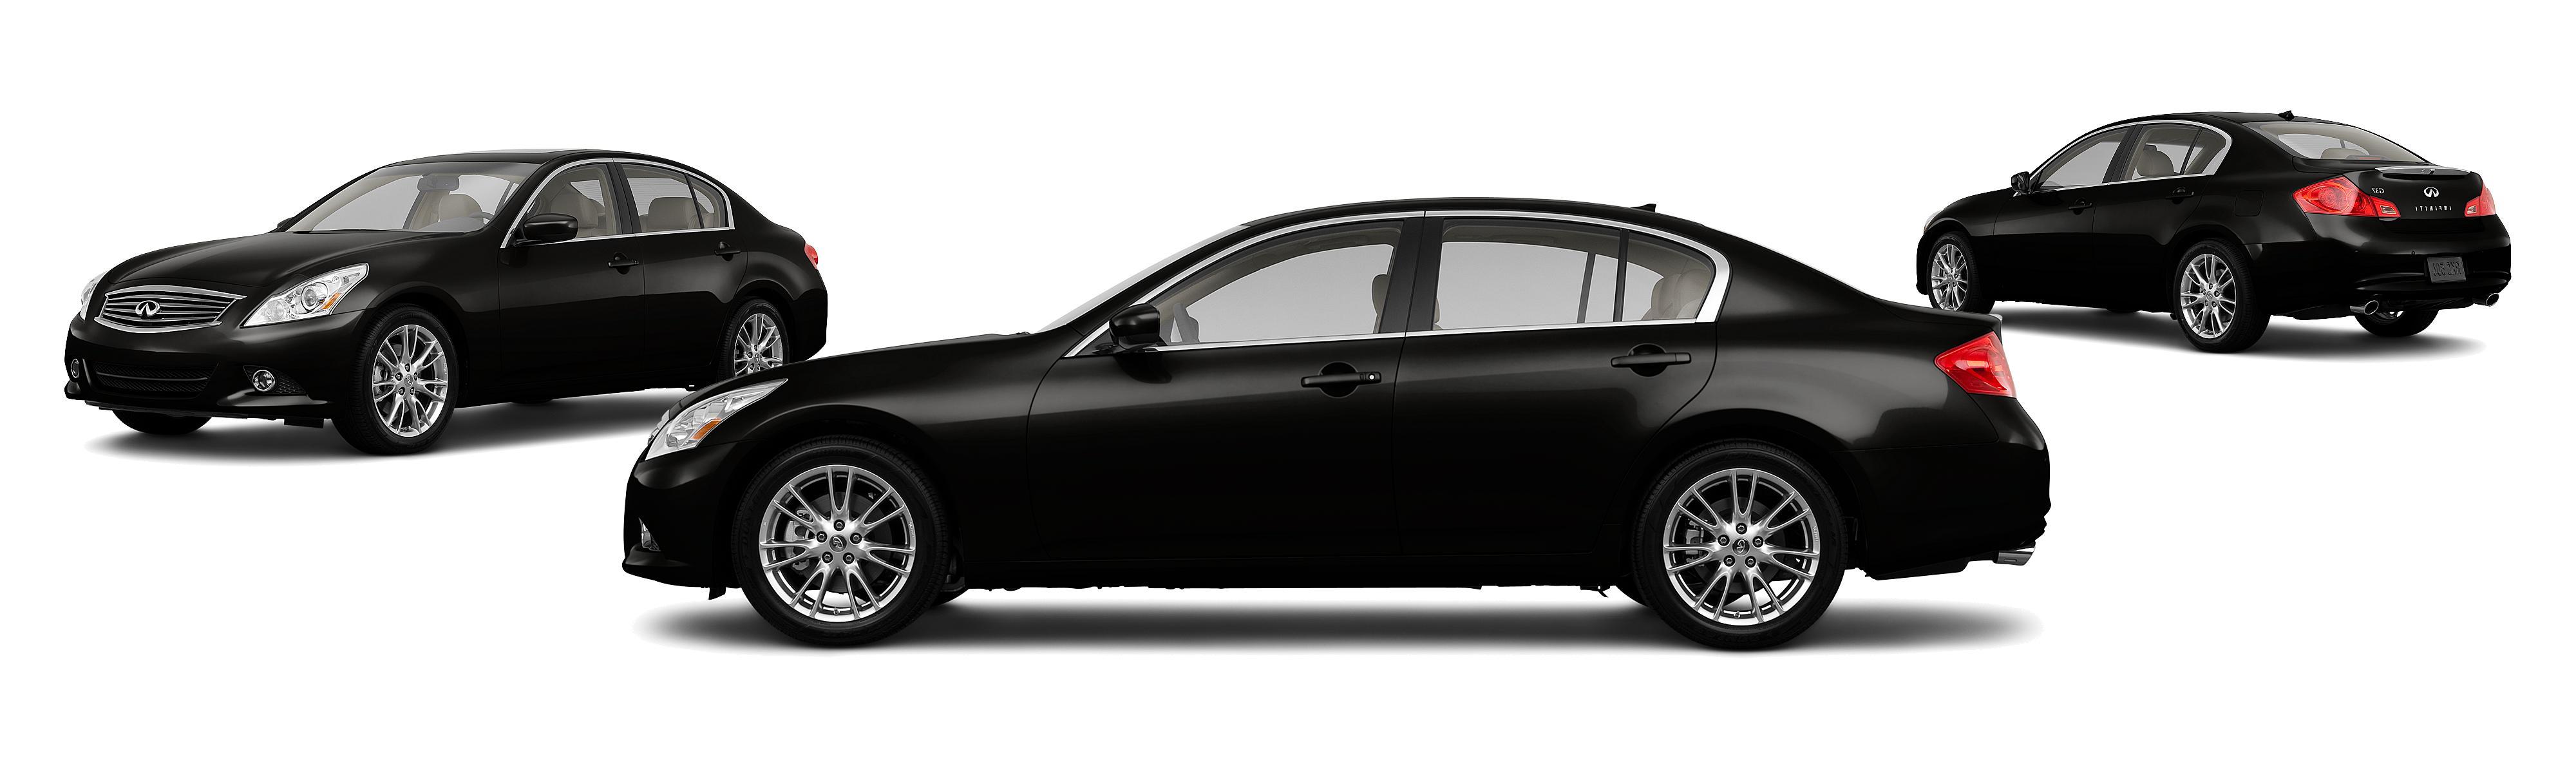 2011 infiniti g37 sedan journey 4dr sedan research groovecar vanachro Image collections